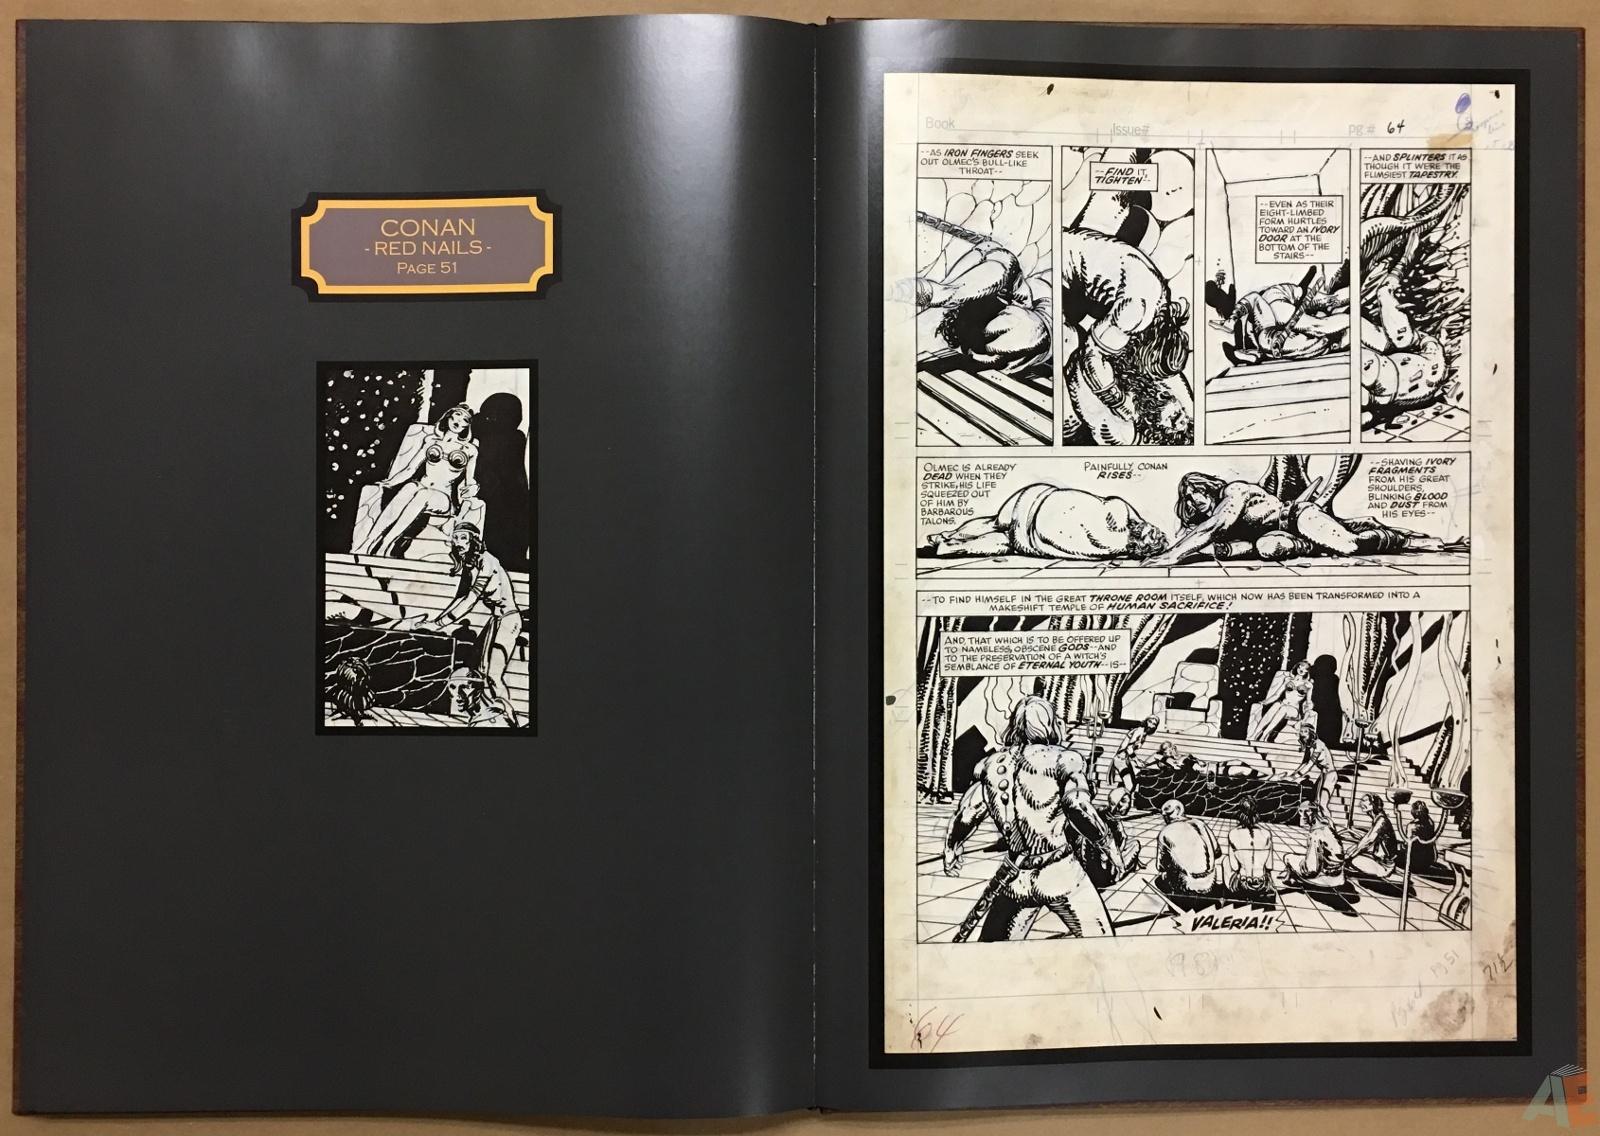 Conan: Red Nails Original Art Archives Volume 1 32